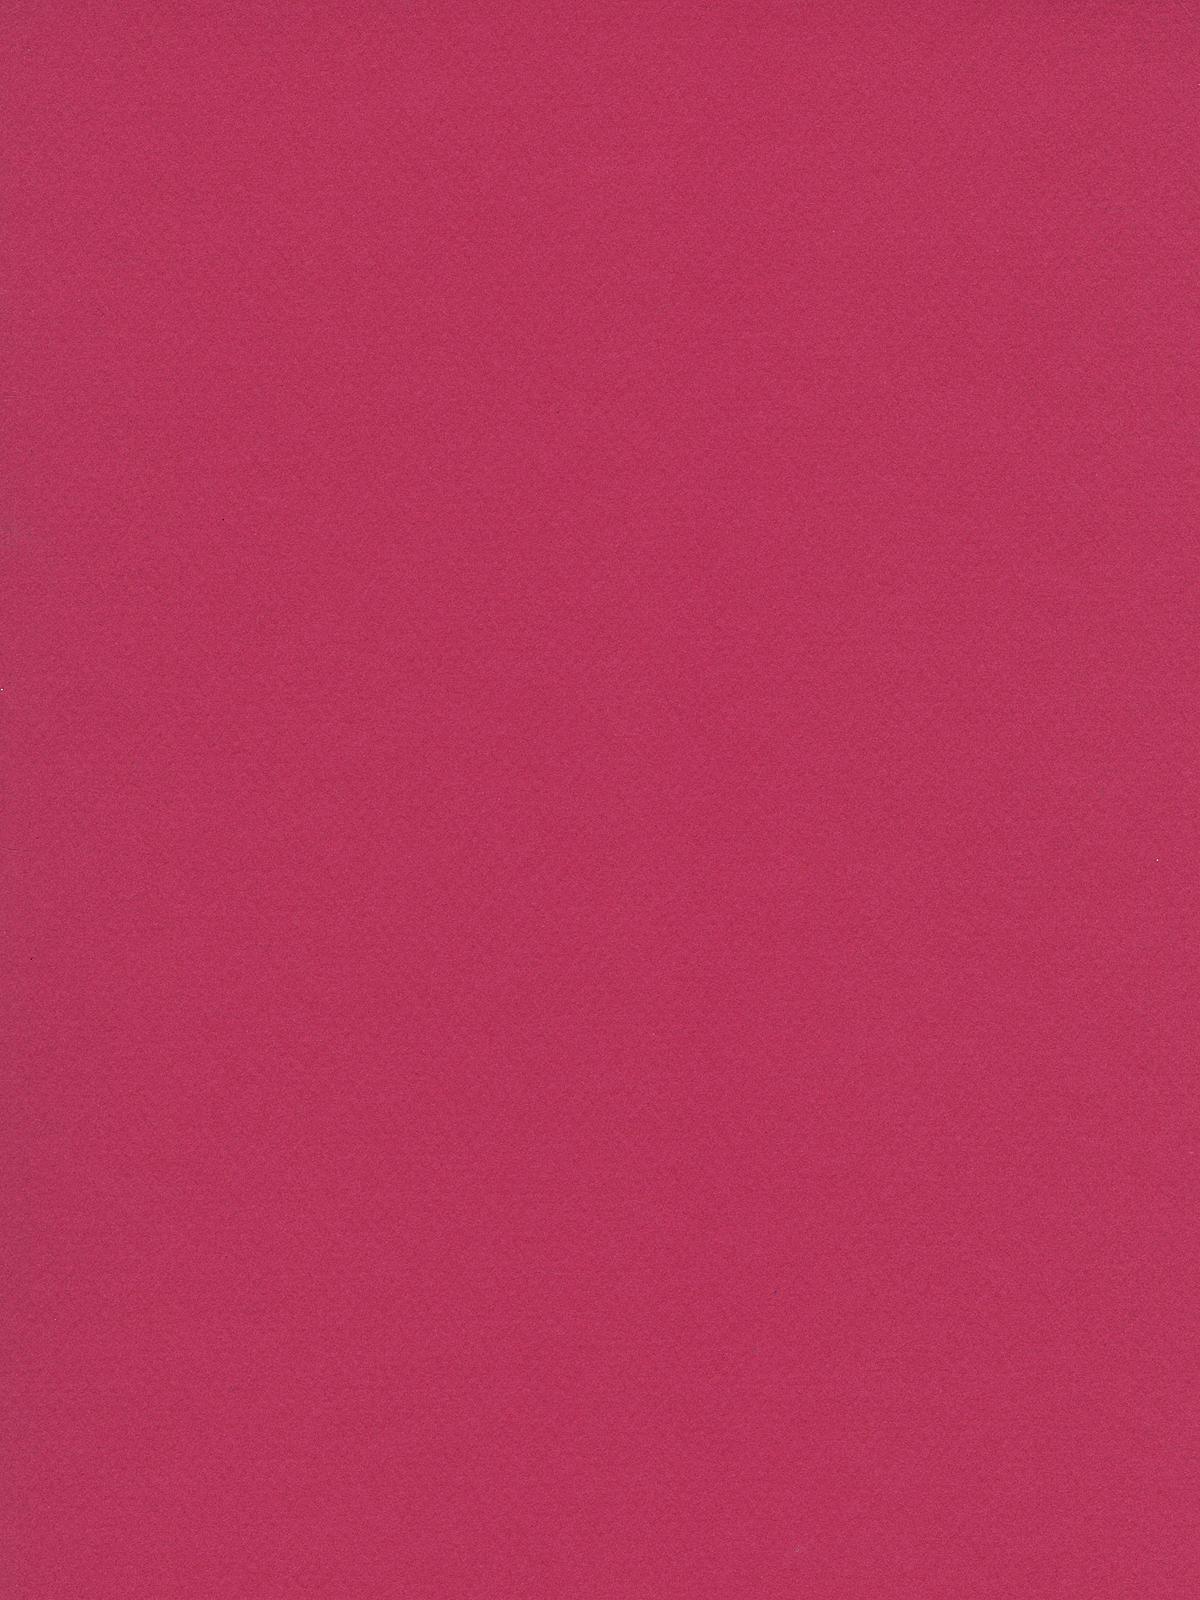 Mi-teintes Tinted Paper Raspberry 19 In. X 25 In.